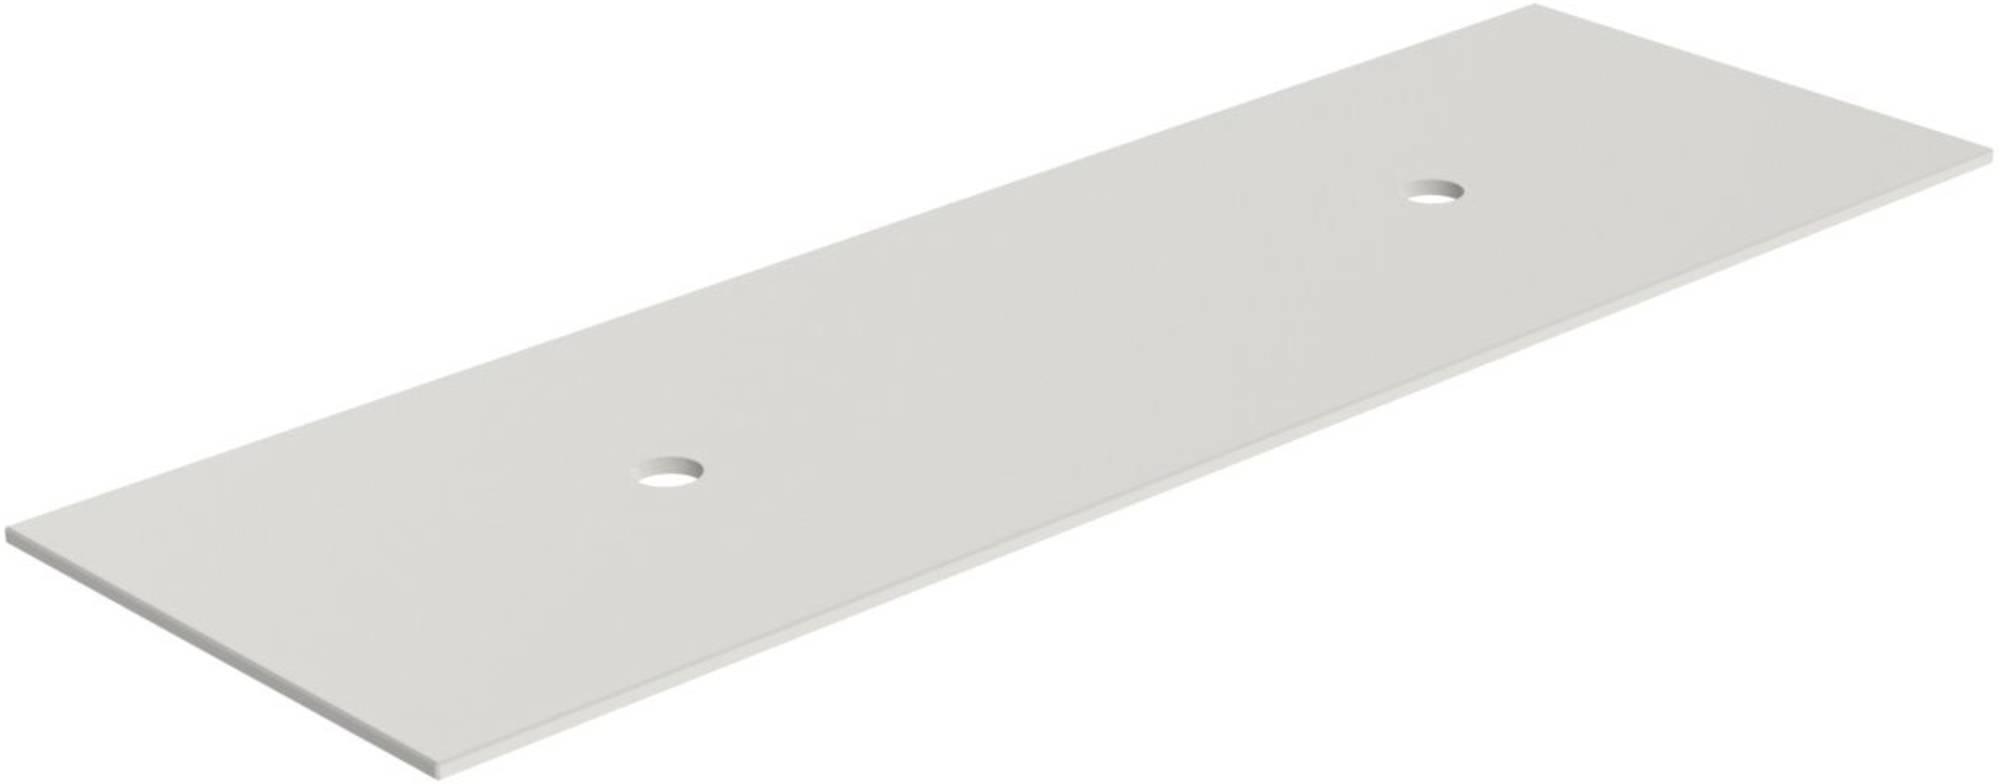 Thebalux Solid X Afdekblad 150x48,5x1,3 cm Cement Grigio Satin